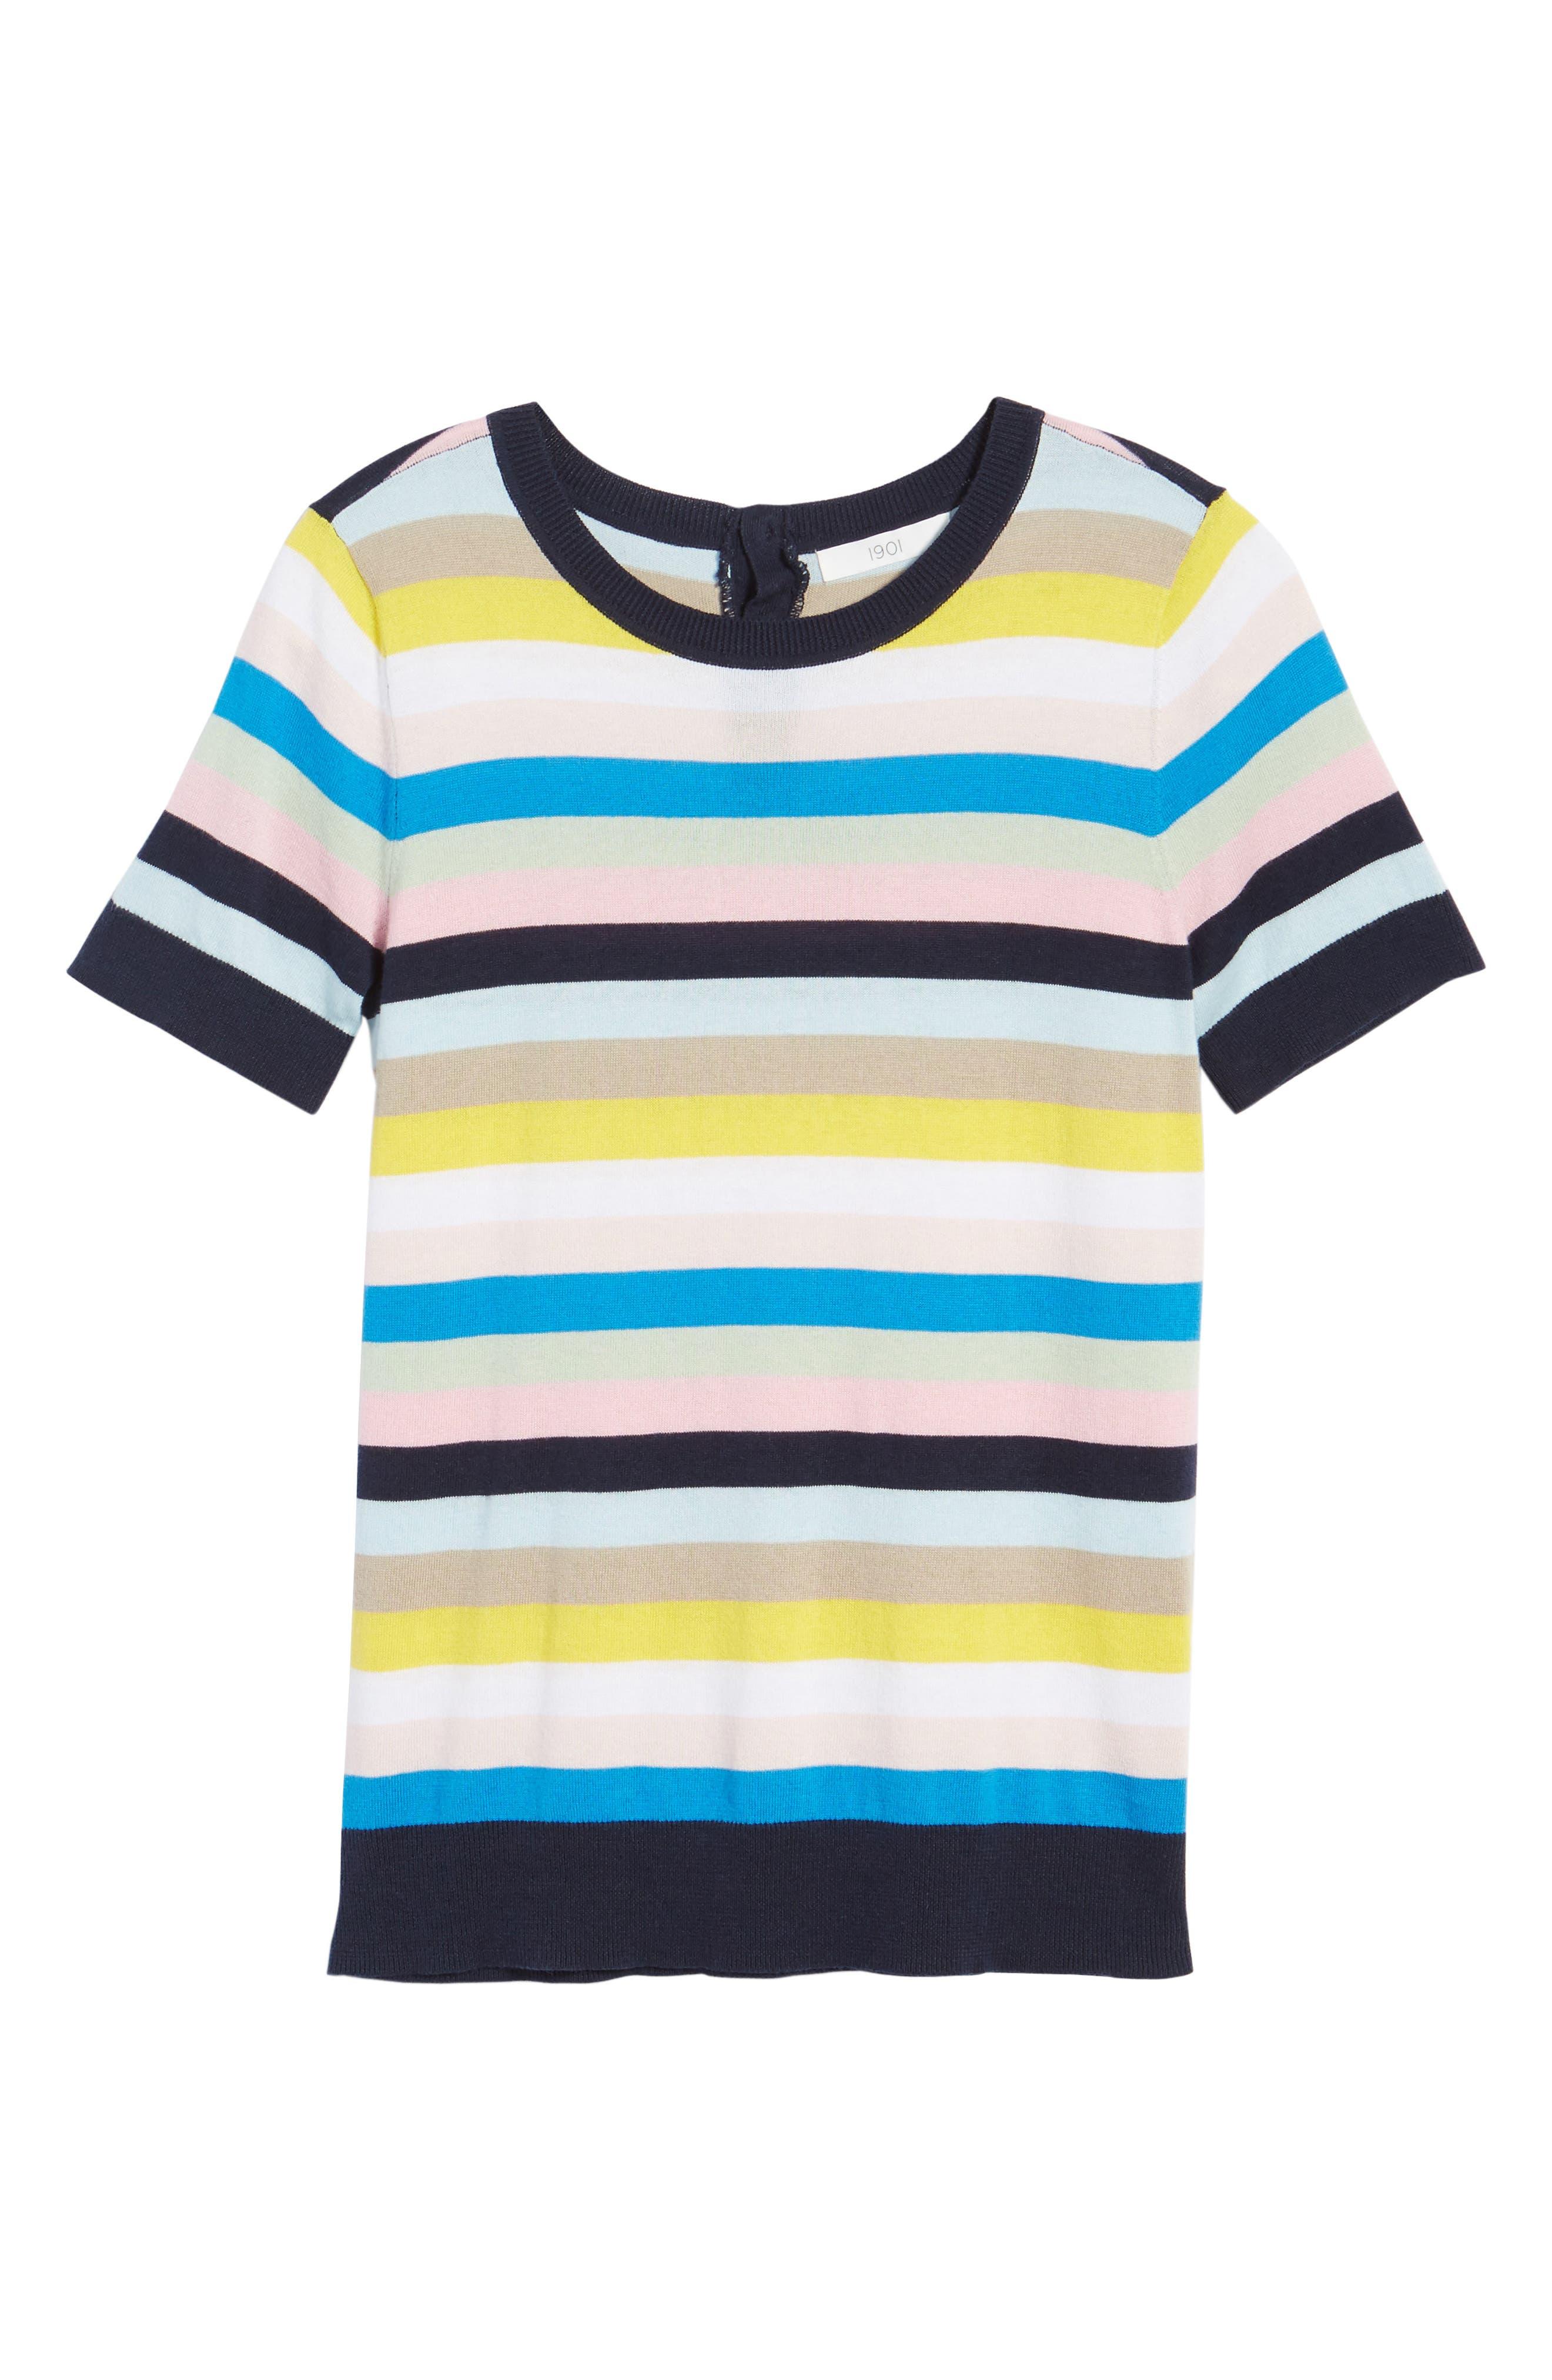 Crewneck Sweater,                             Alternate thumbnail 3, color,                             Blue Multi Stripe